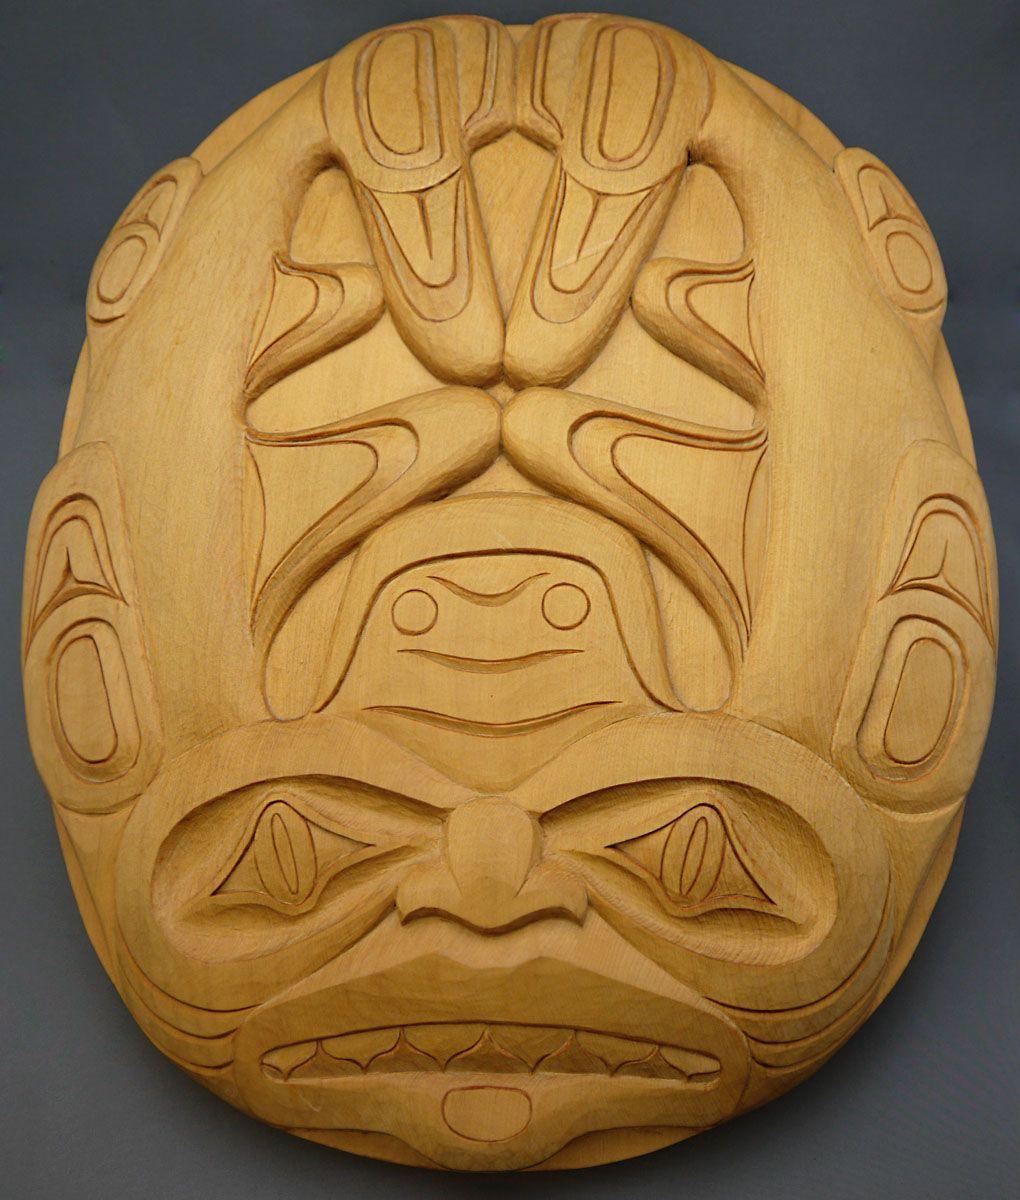 Harold f clayton stone carvers guild